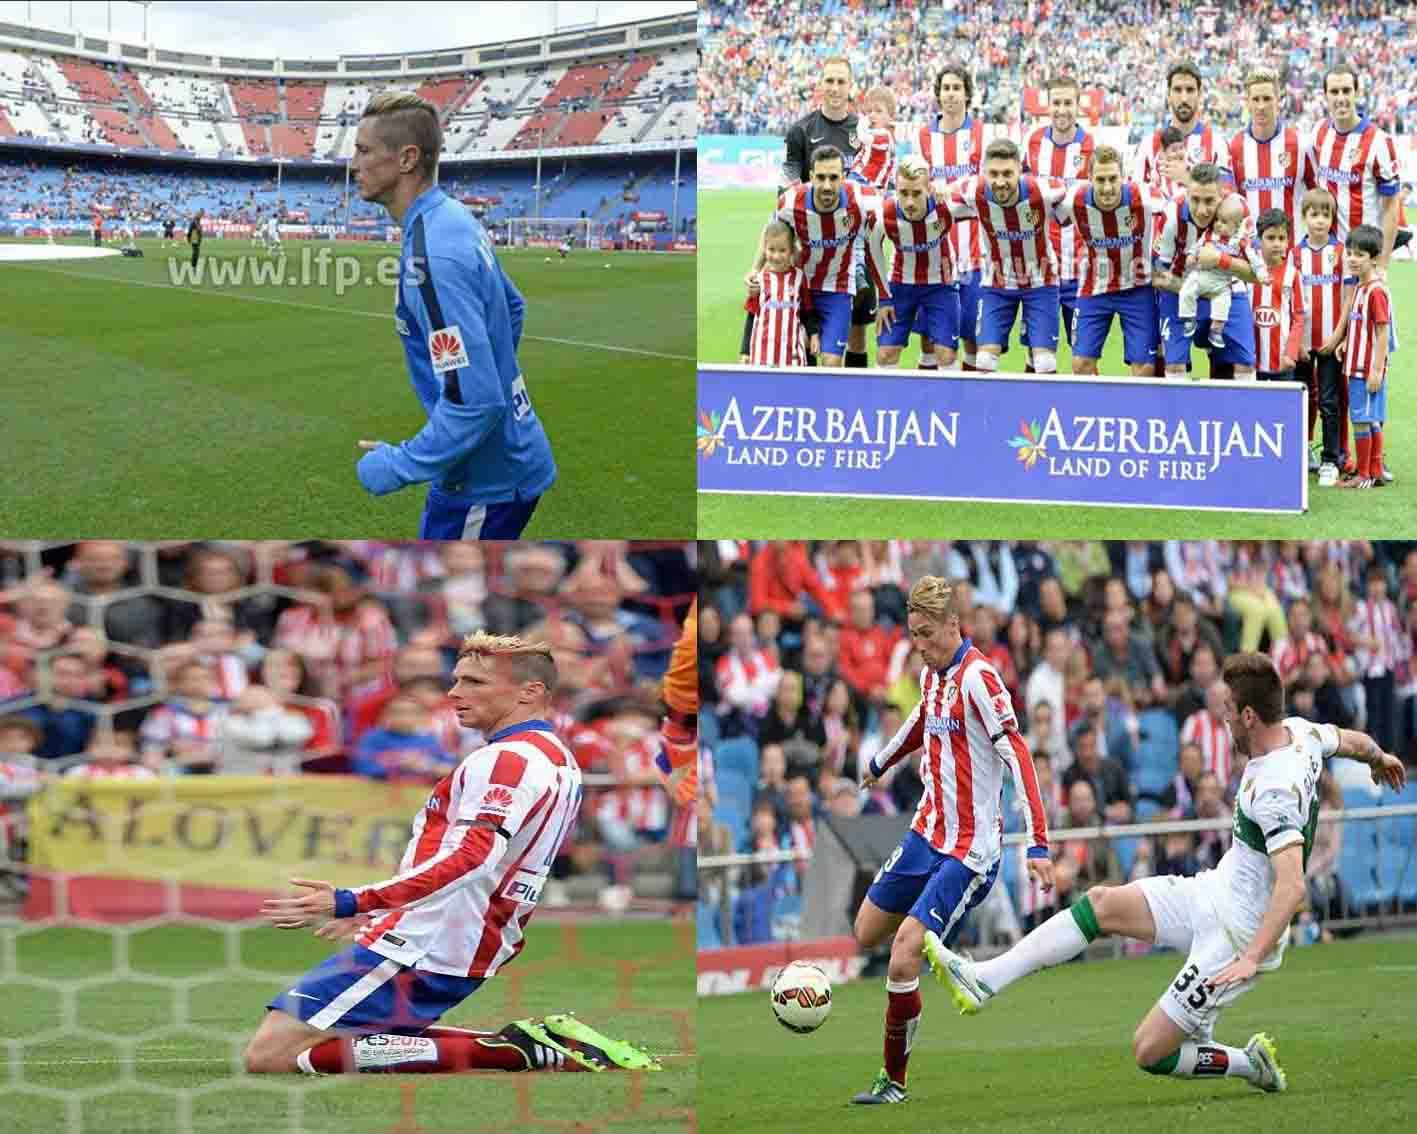 http://s4.picofile.com/file/8185292842/Fernando_Torres_Pics_Against_Elche_By_F9TFANS_BLOGSKY_COM_16_.jpg